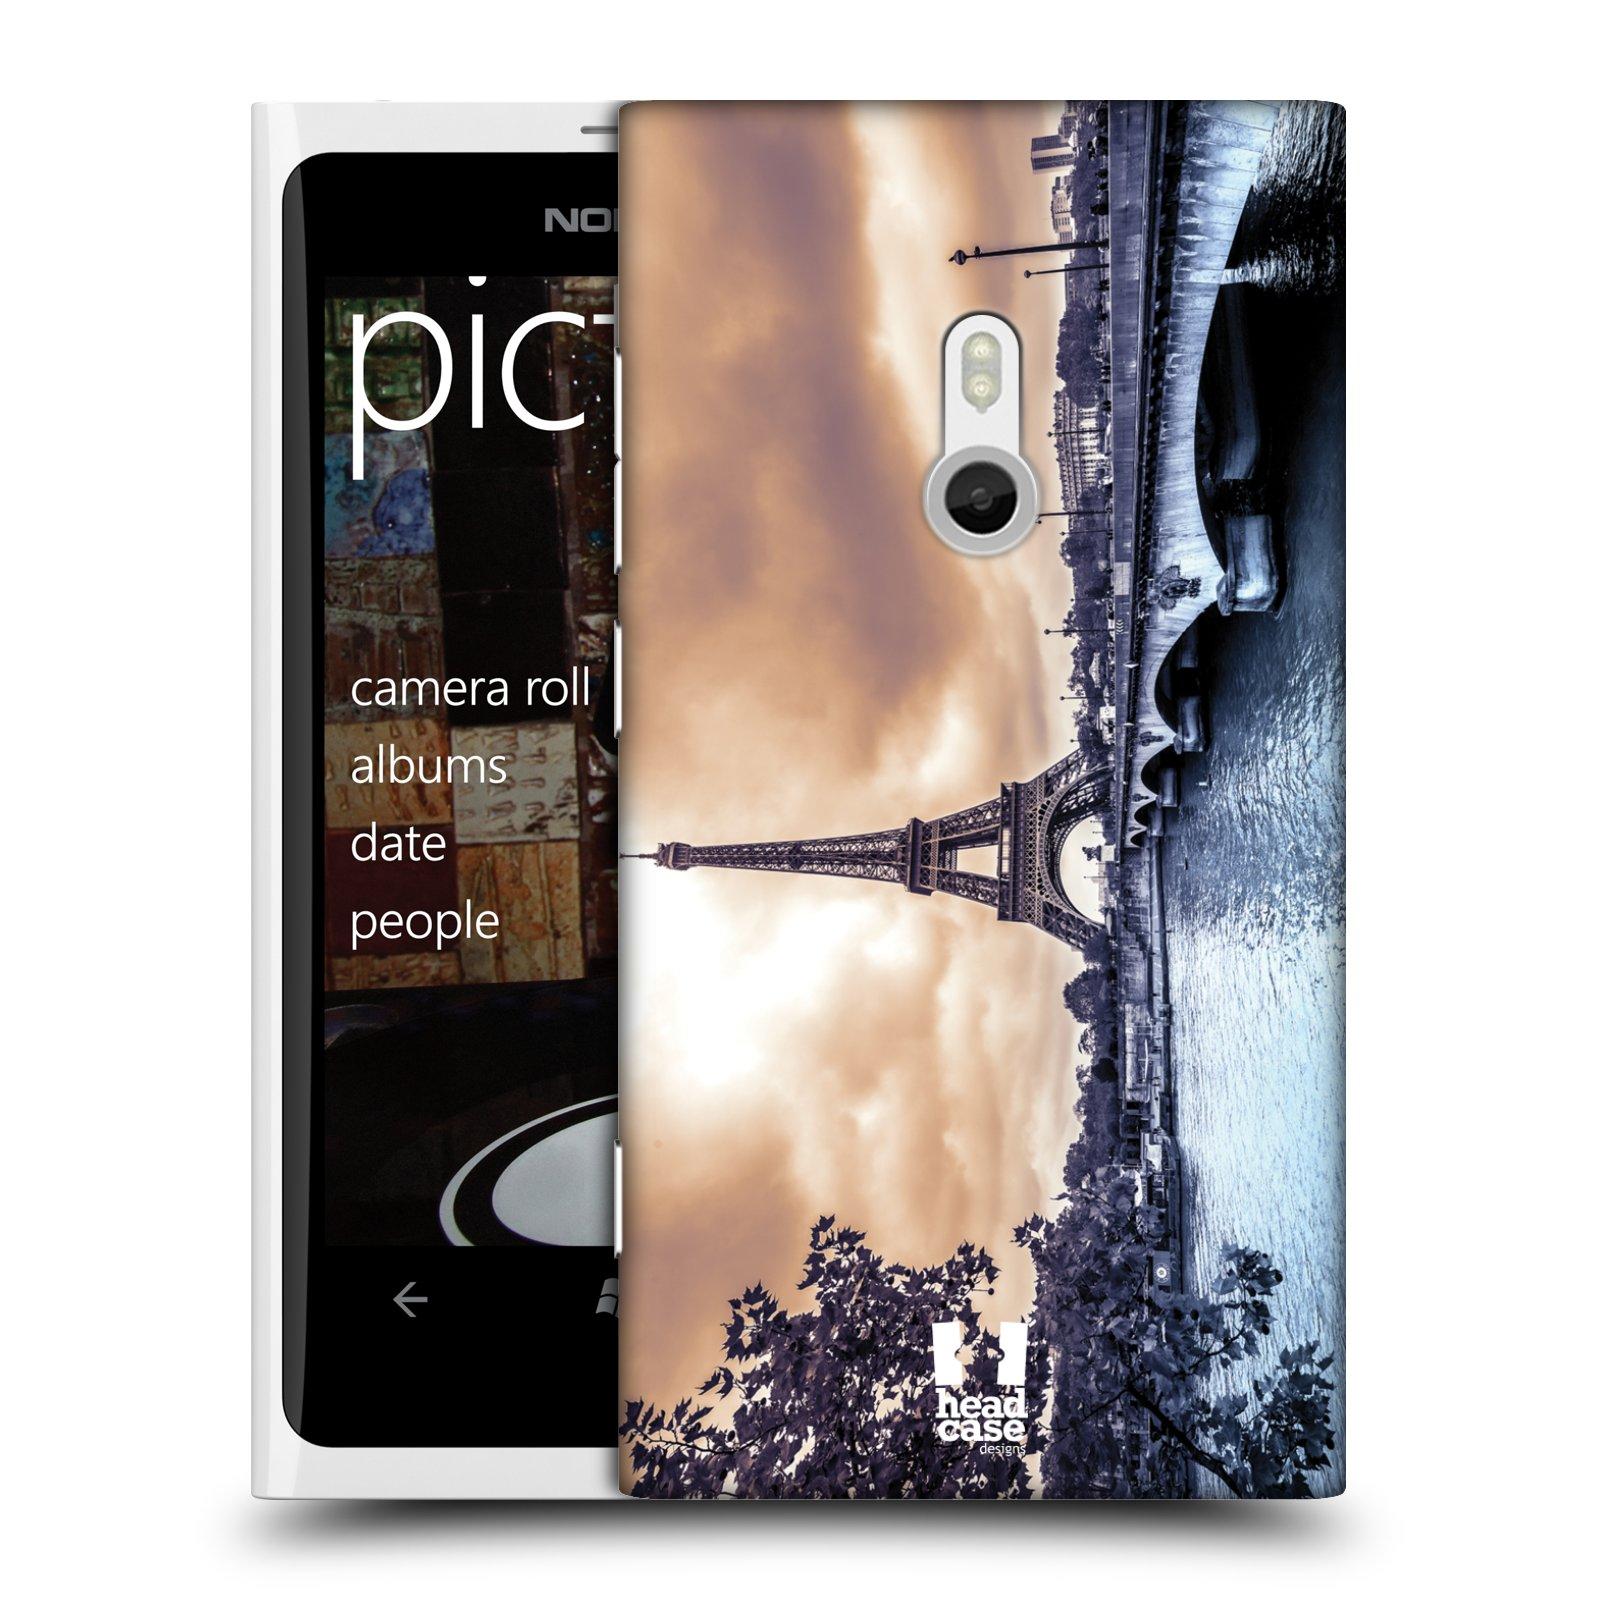 Plastové pouzdro na mobil Nokia Lumia 800 HEAD CASE PAŘÍŽ (Kryt či obal na mobilní telefon Nokia Lumia 800)